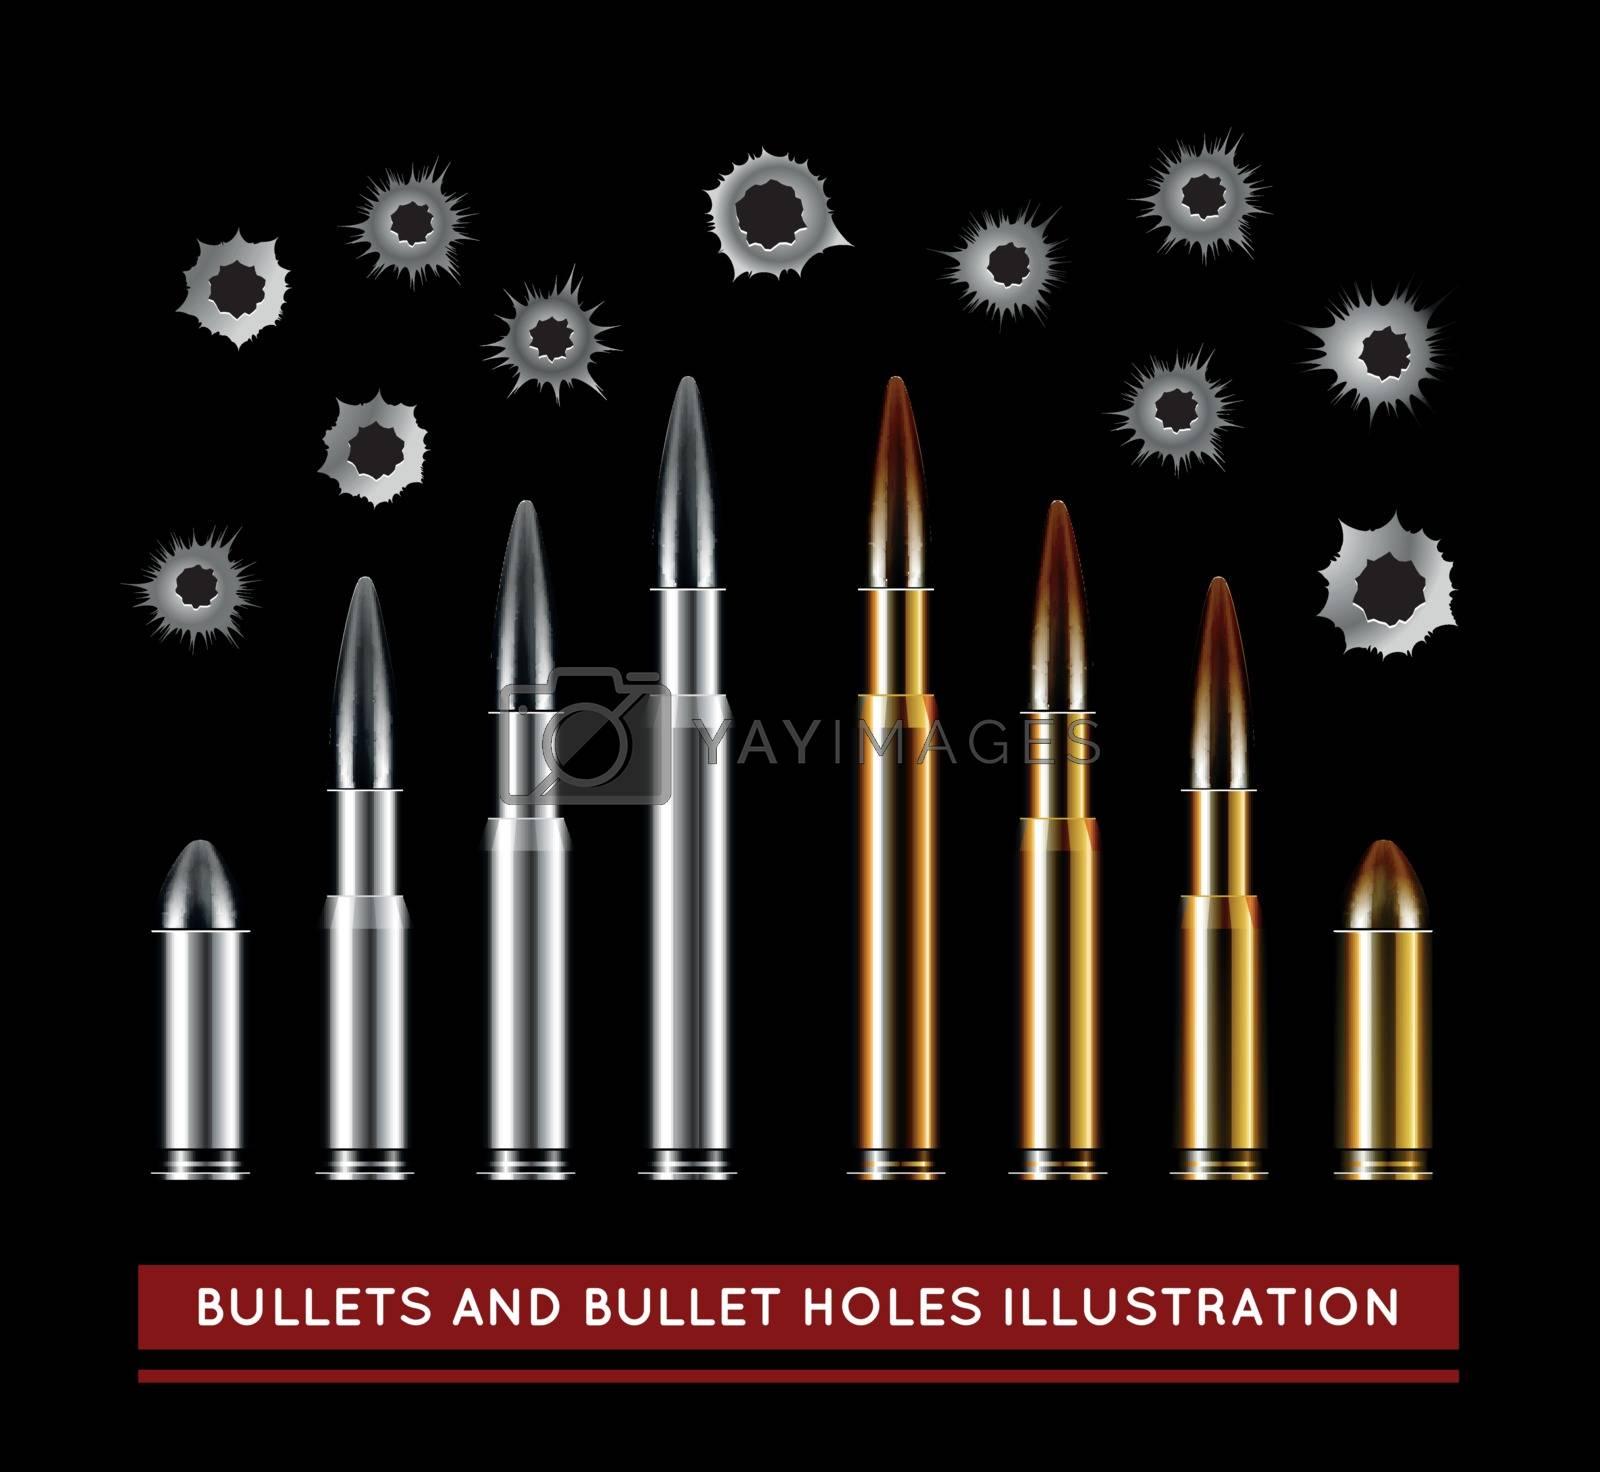 Bullets and bullet holes. Vector illustration on black background